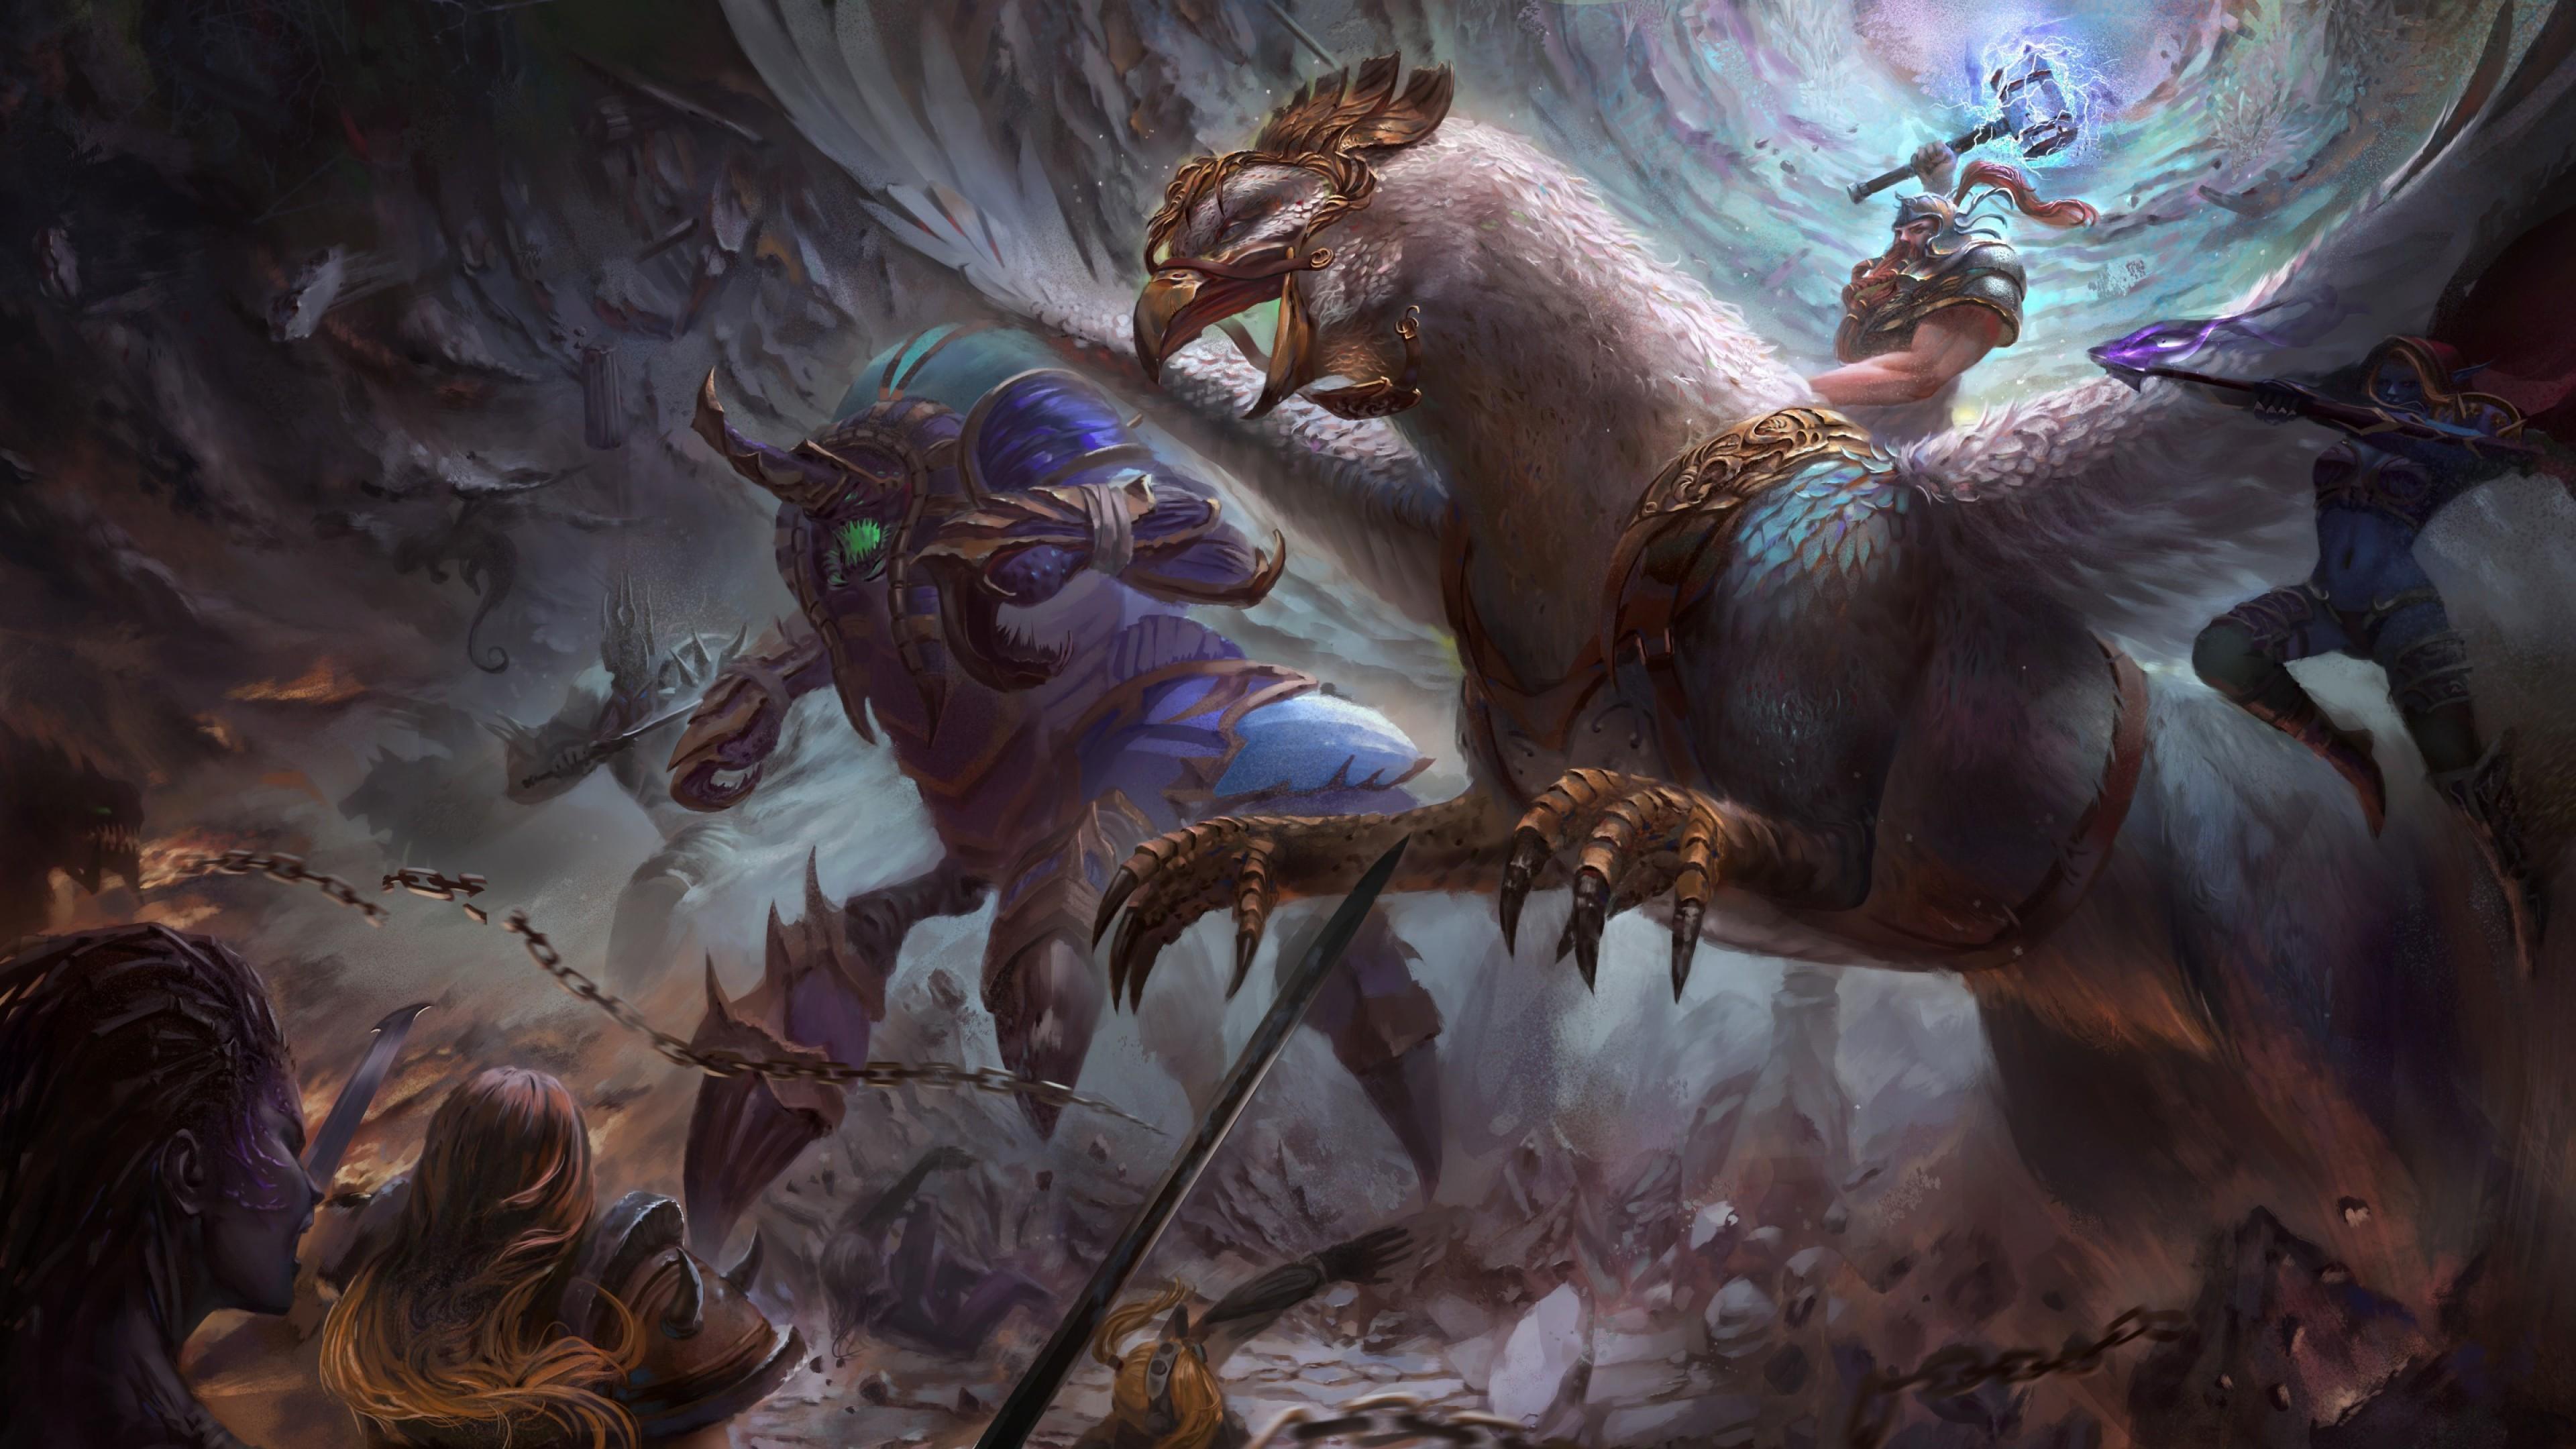 Wallpaper starcraft, heroes of the storm, diablo, sarah kerrigan